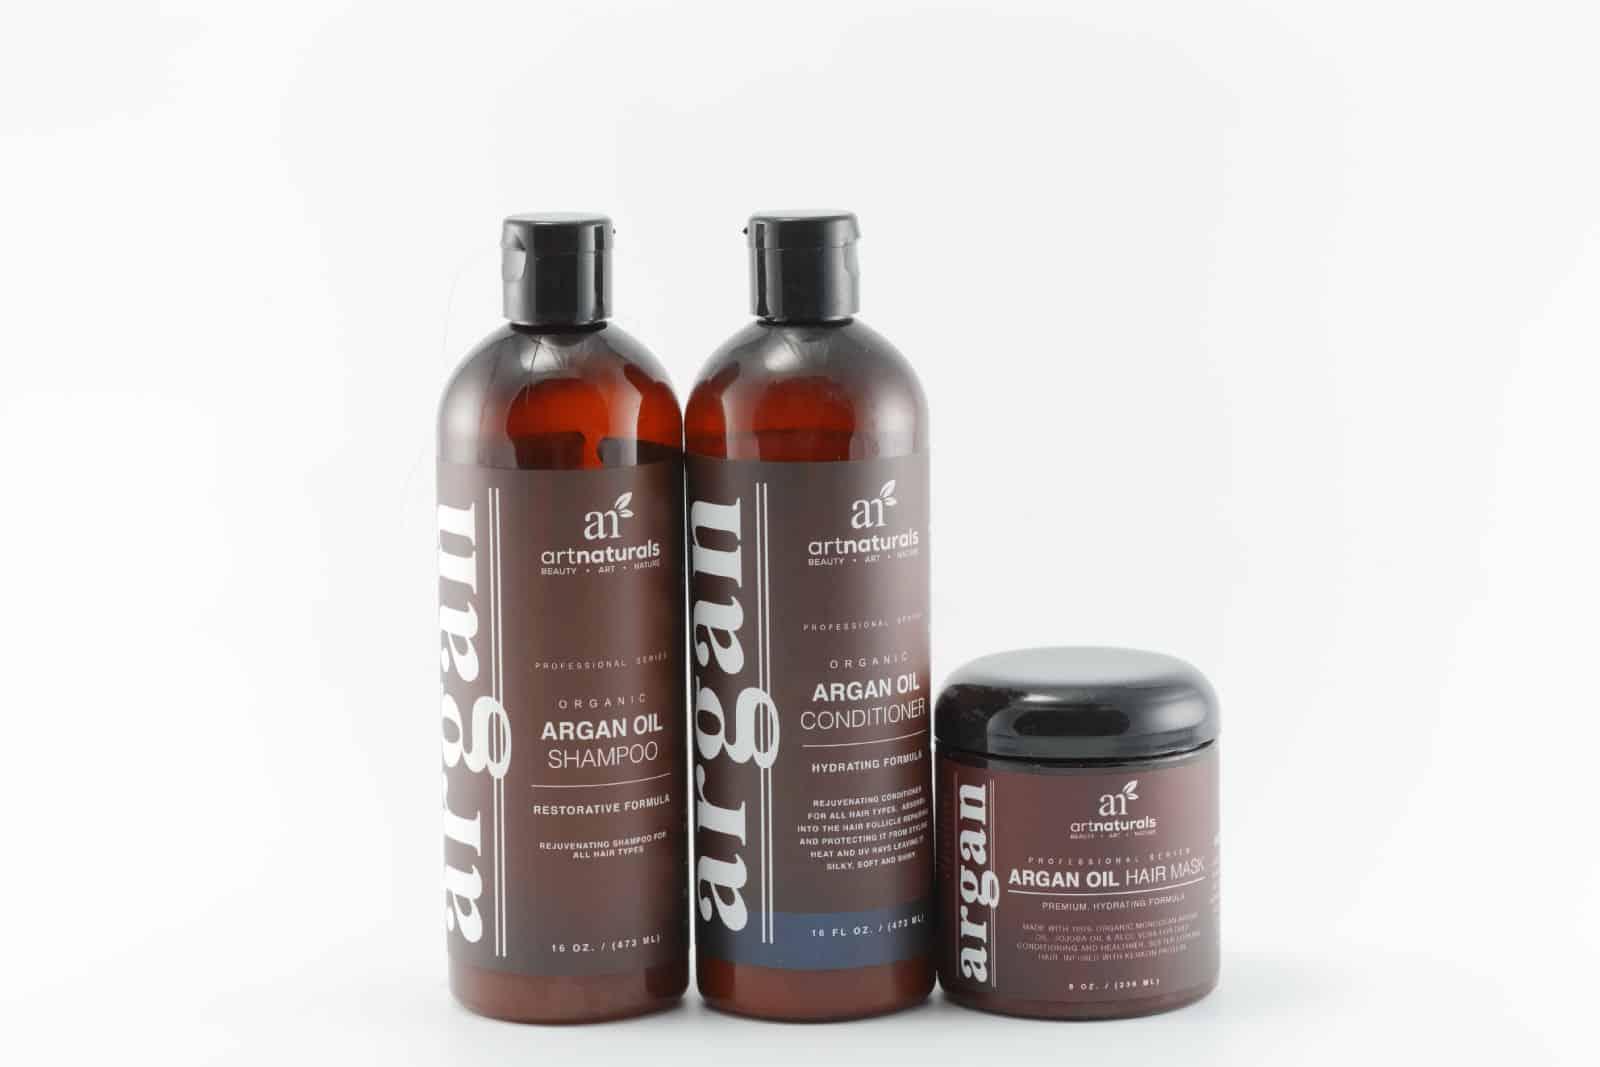 Argan oil product